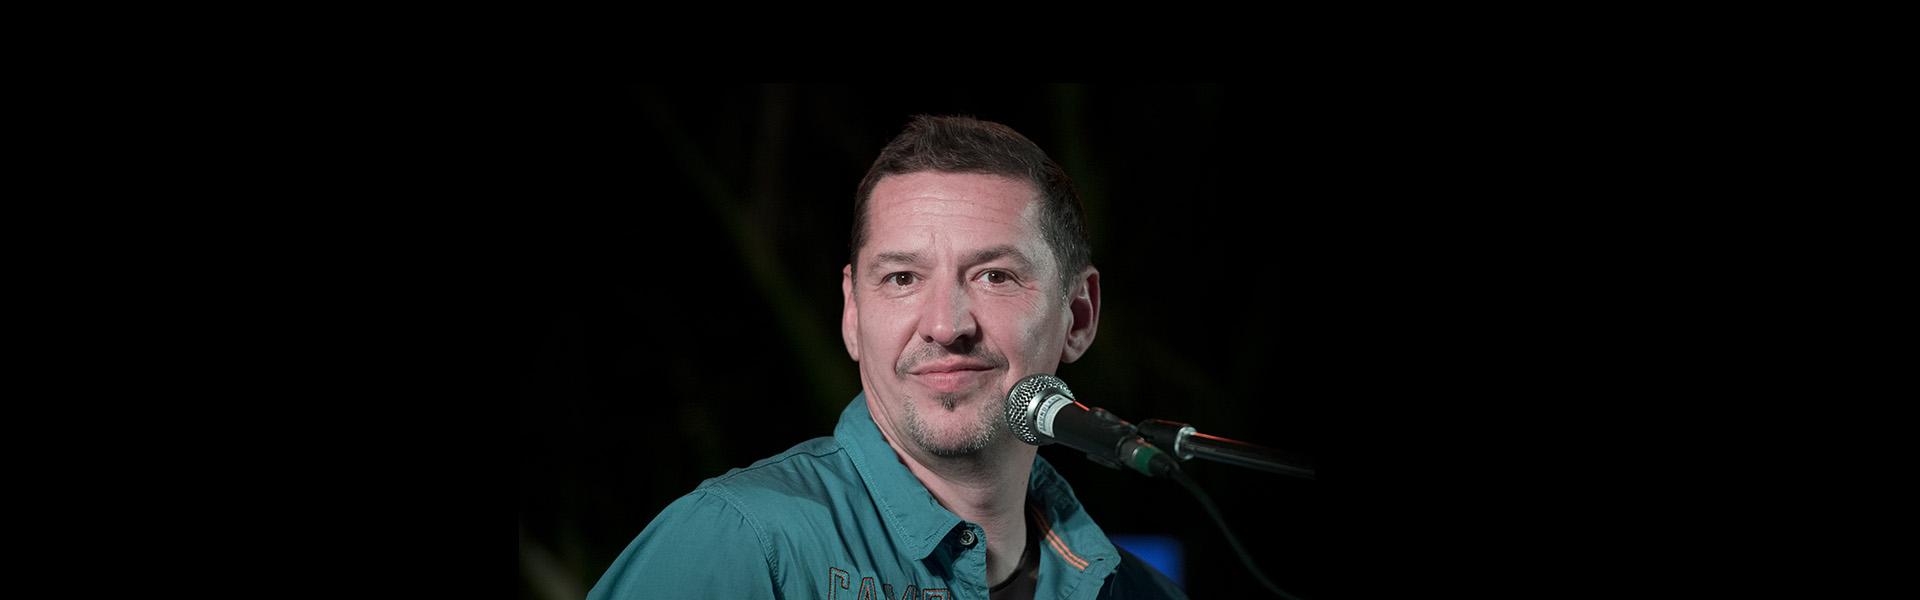 Ingo Sibert: Schlagzeuger bei time4music